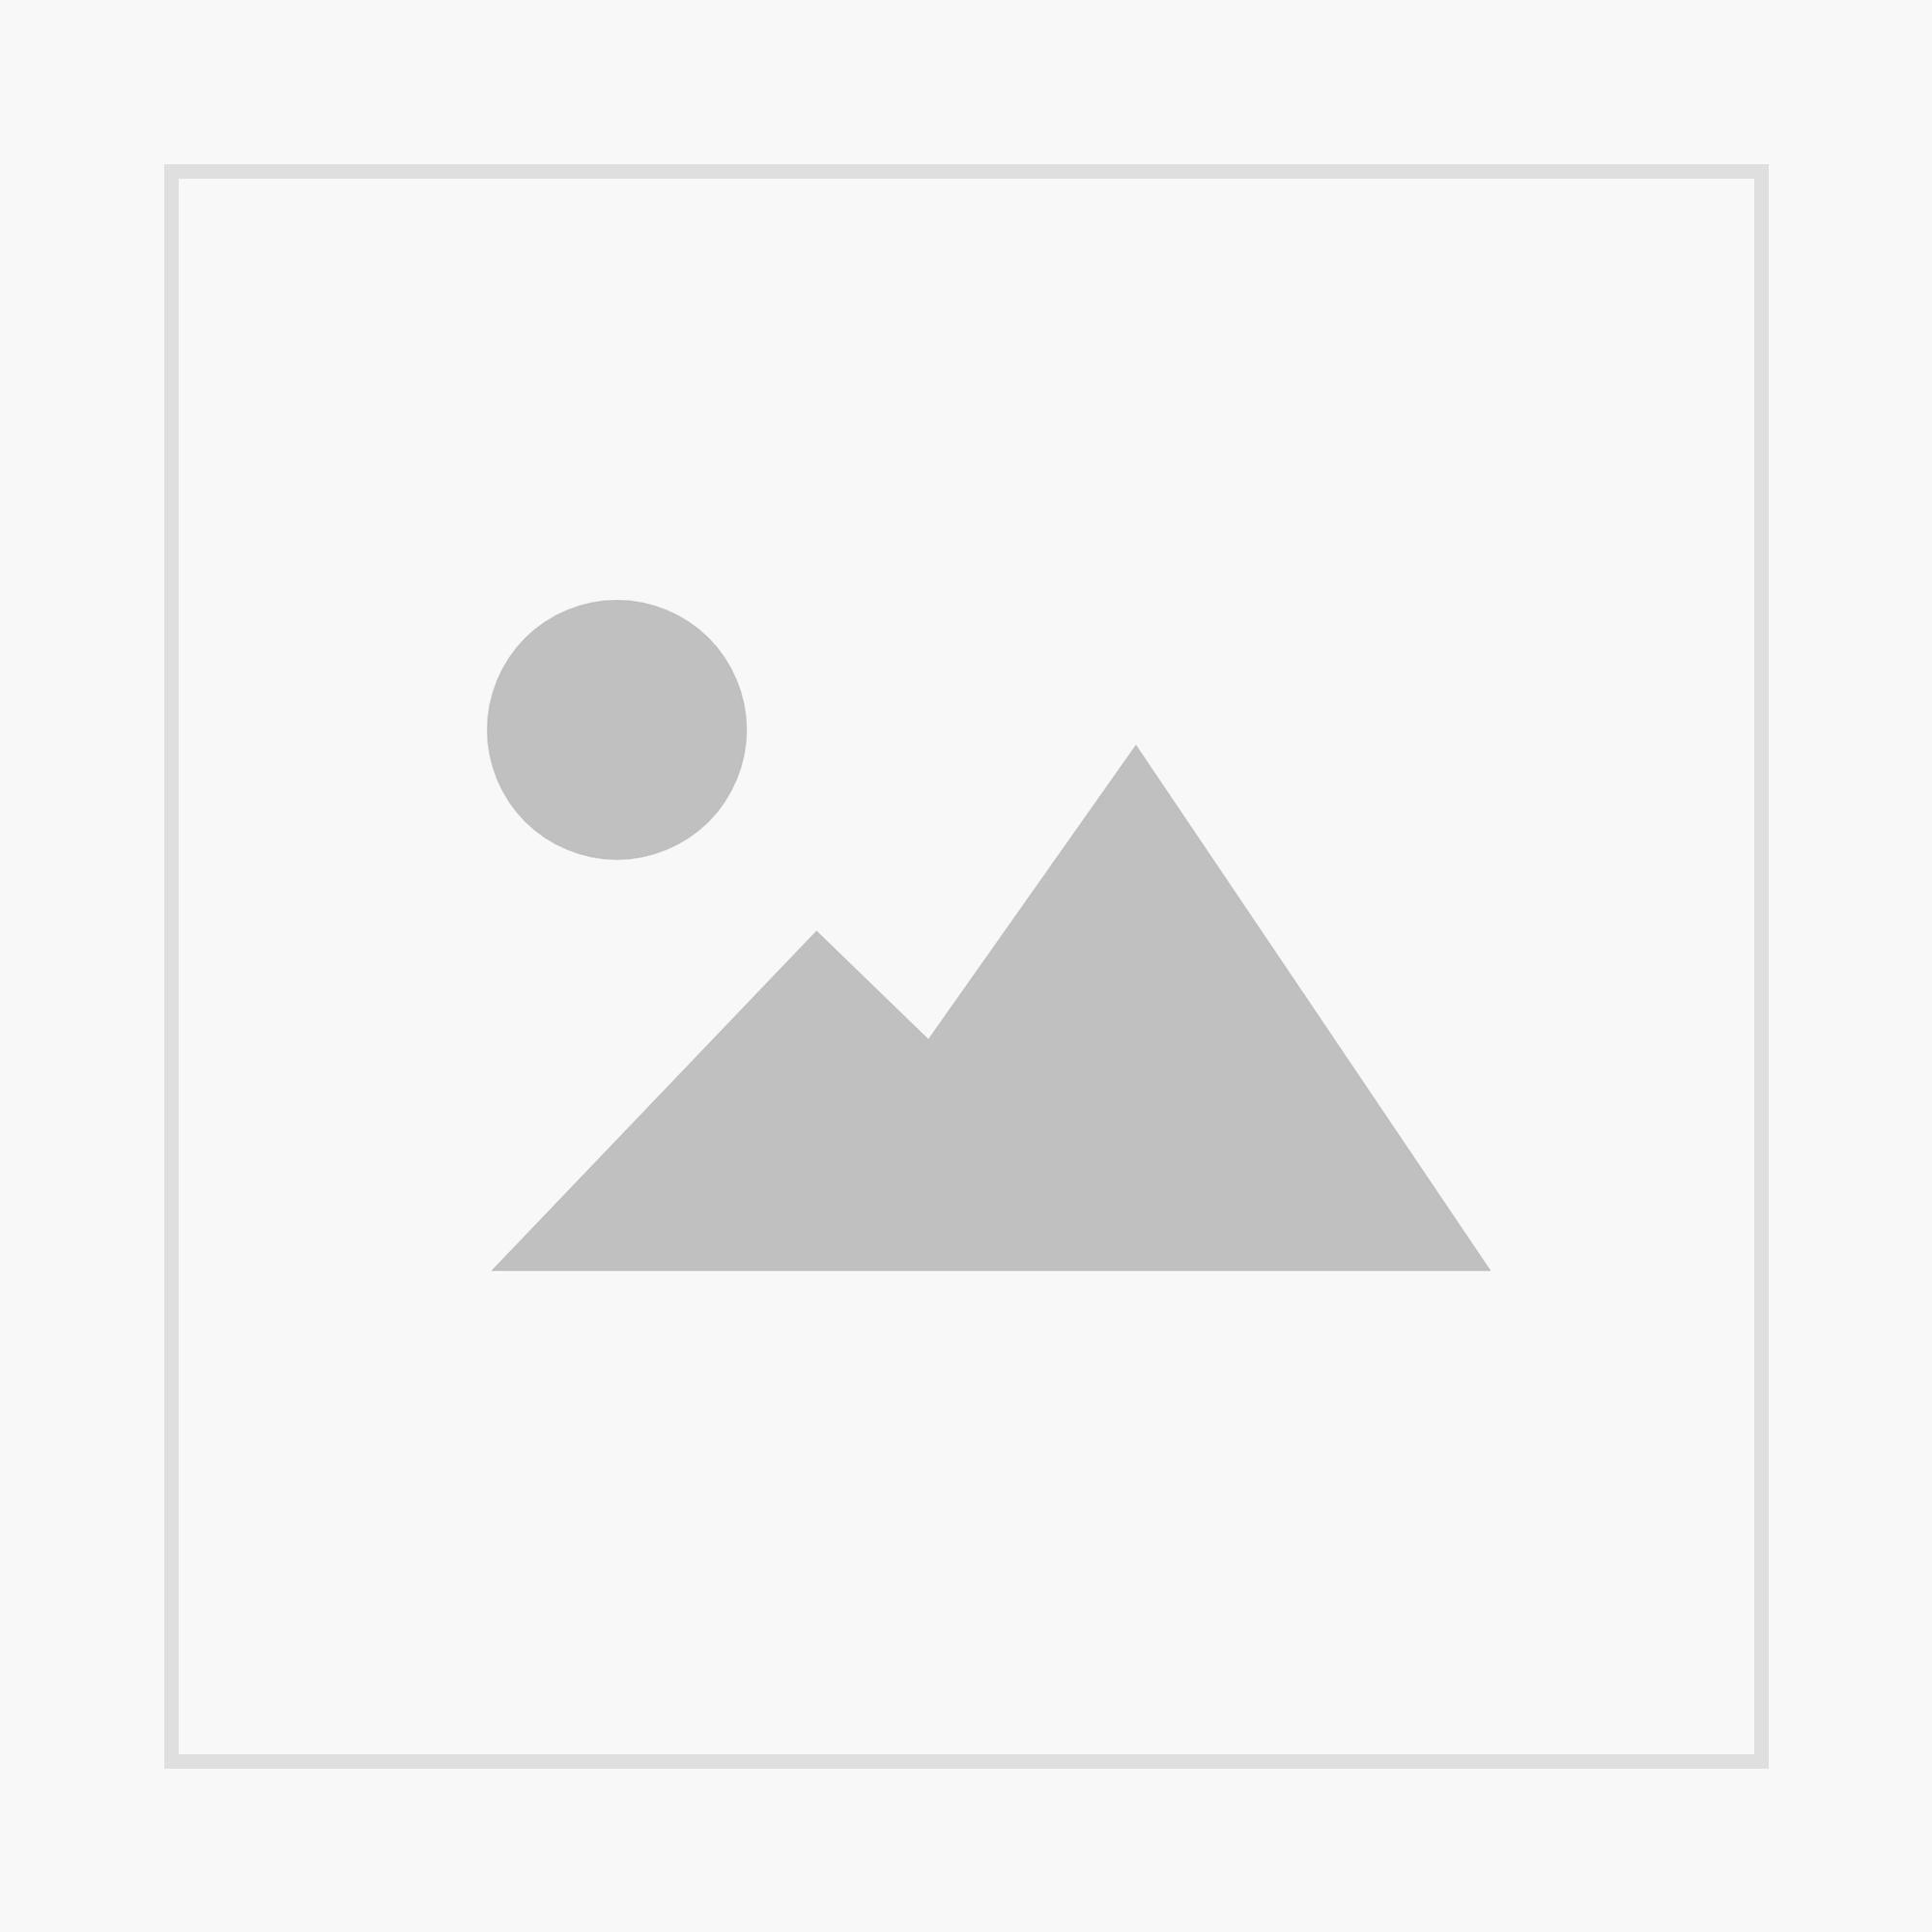 David gegen Goliath - Krone